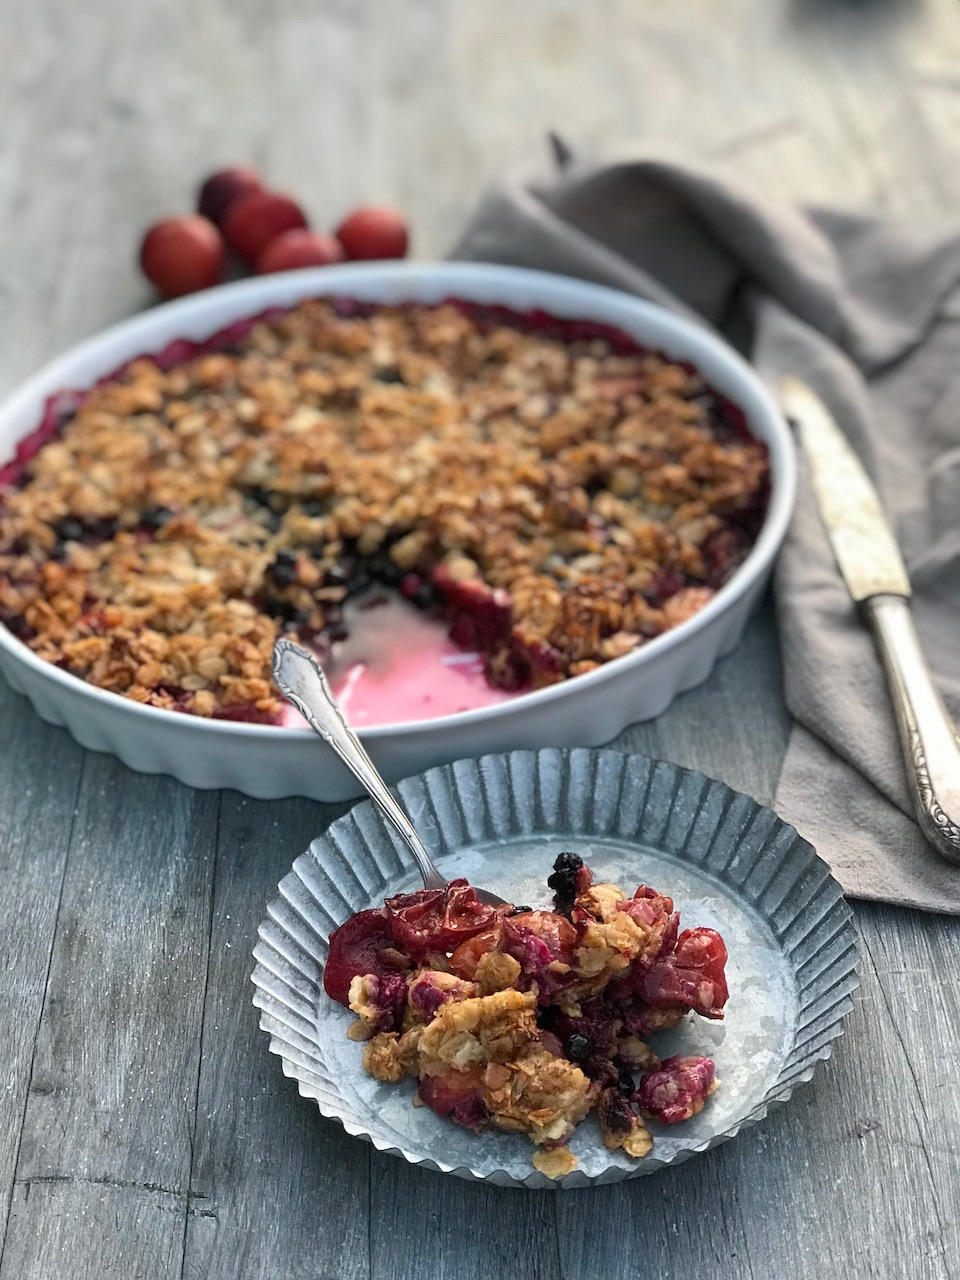 Glutenfri smuldrepai med bær og havregryn